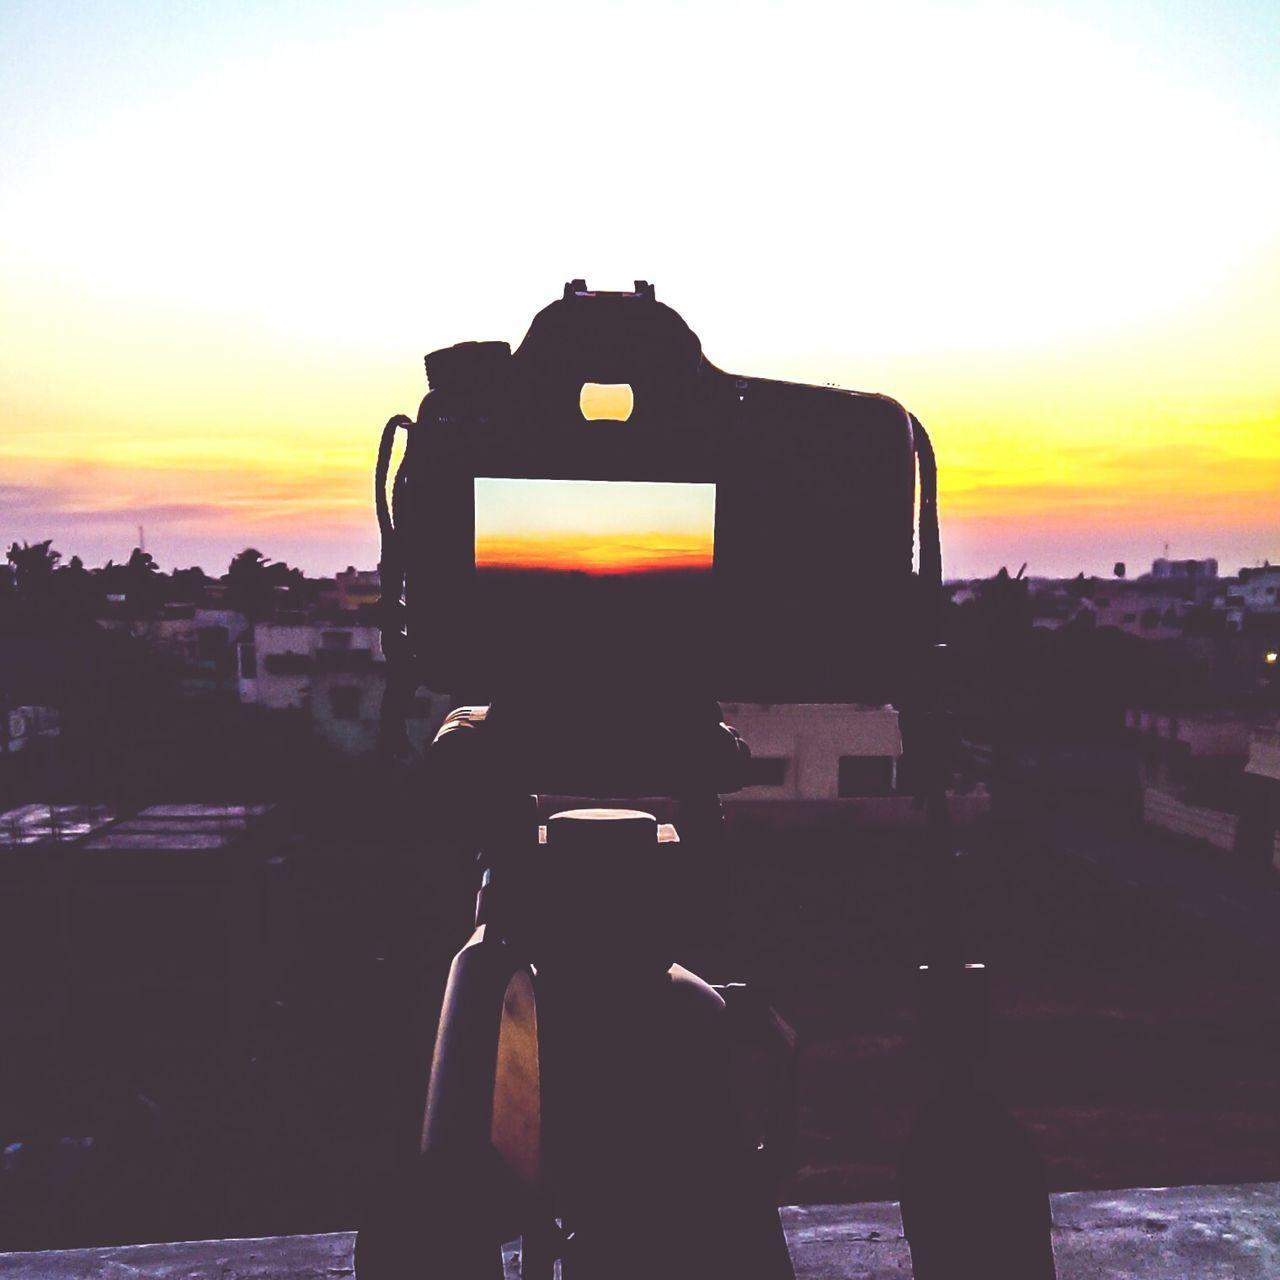 Sunset View Being Seen Through Camera